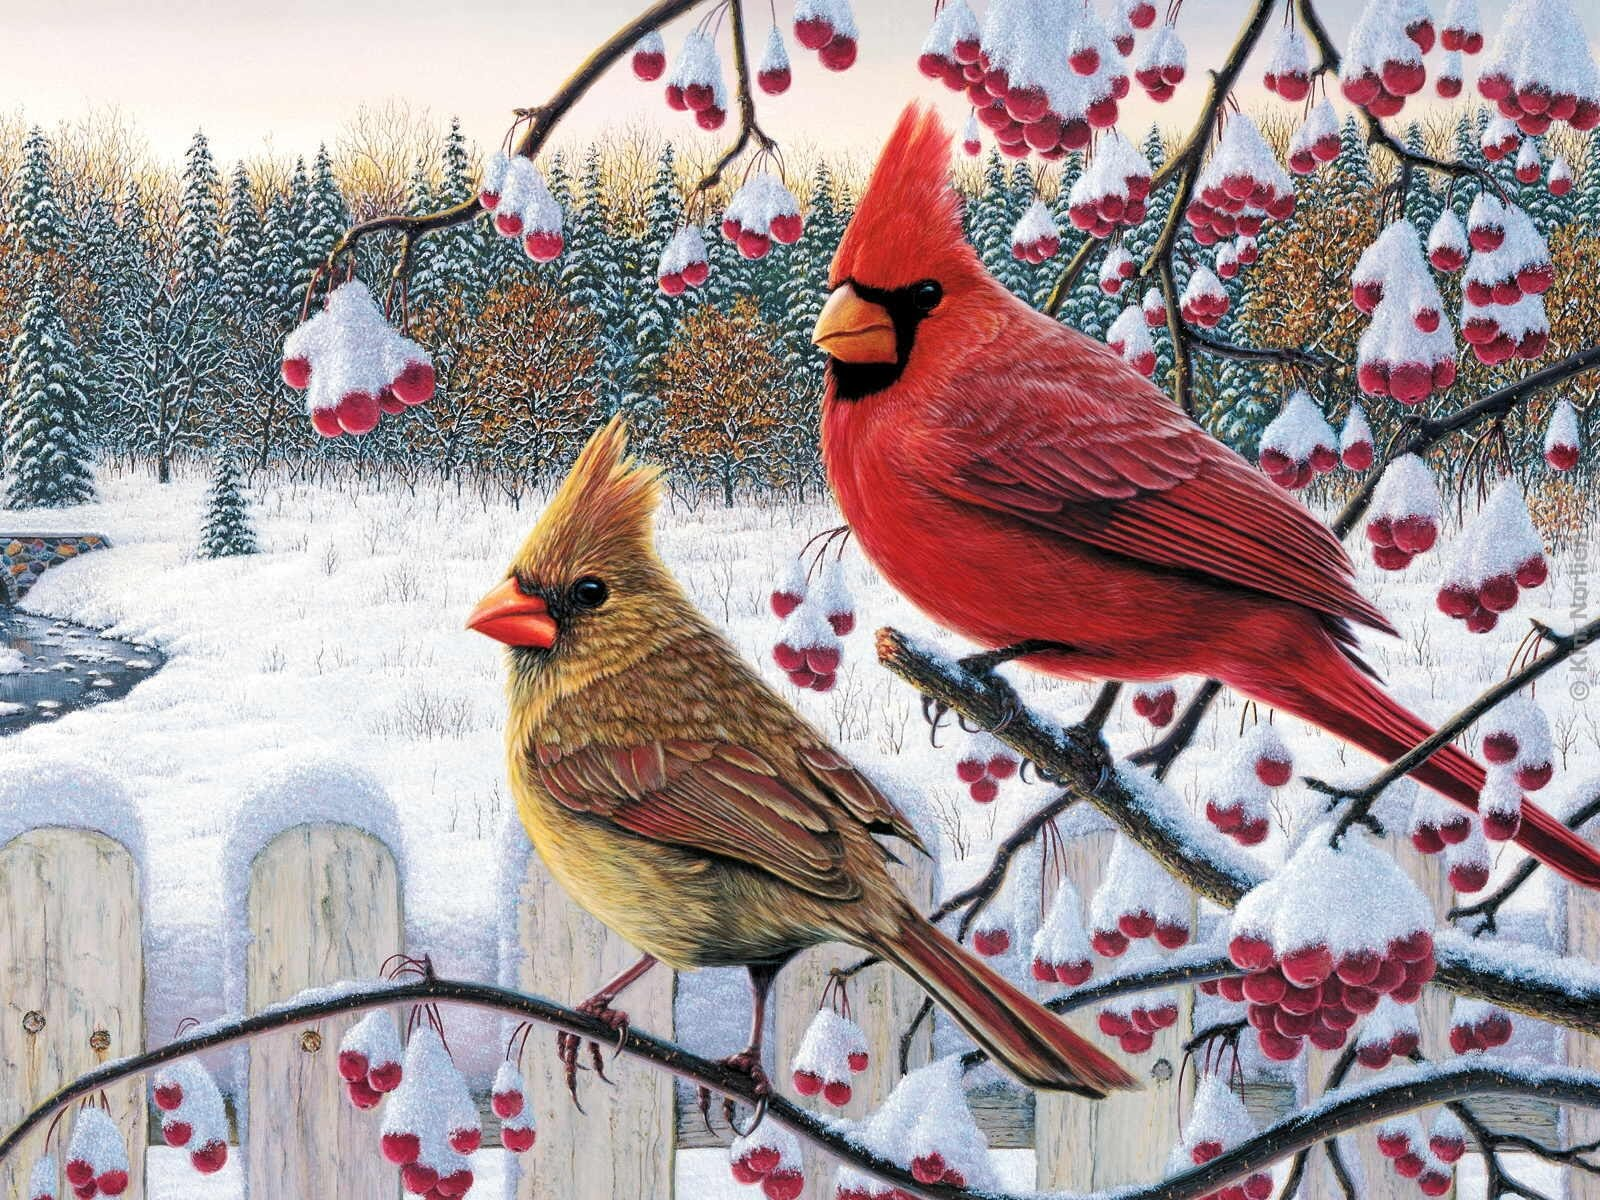 Winter bird images - photo#41